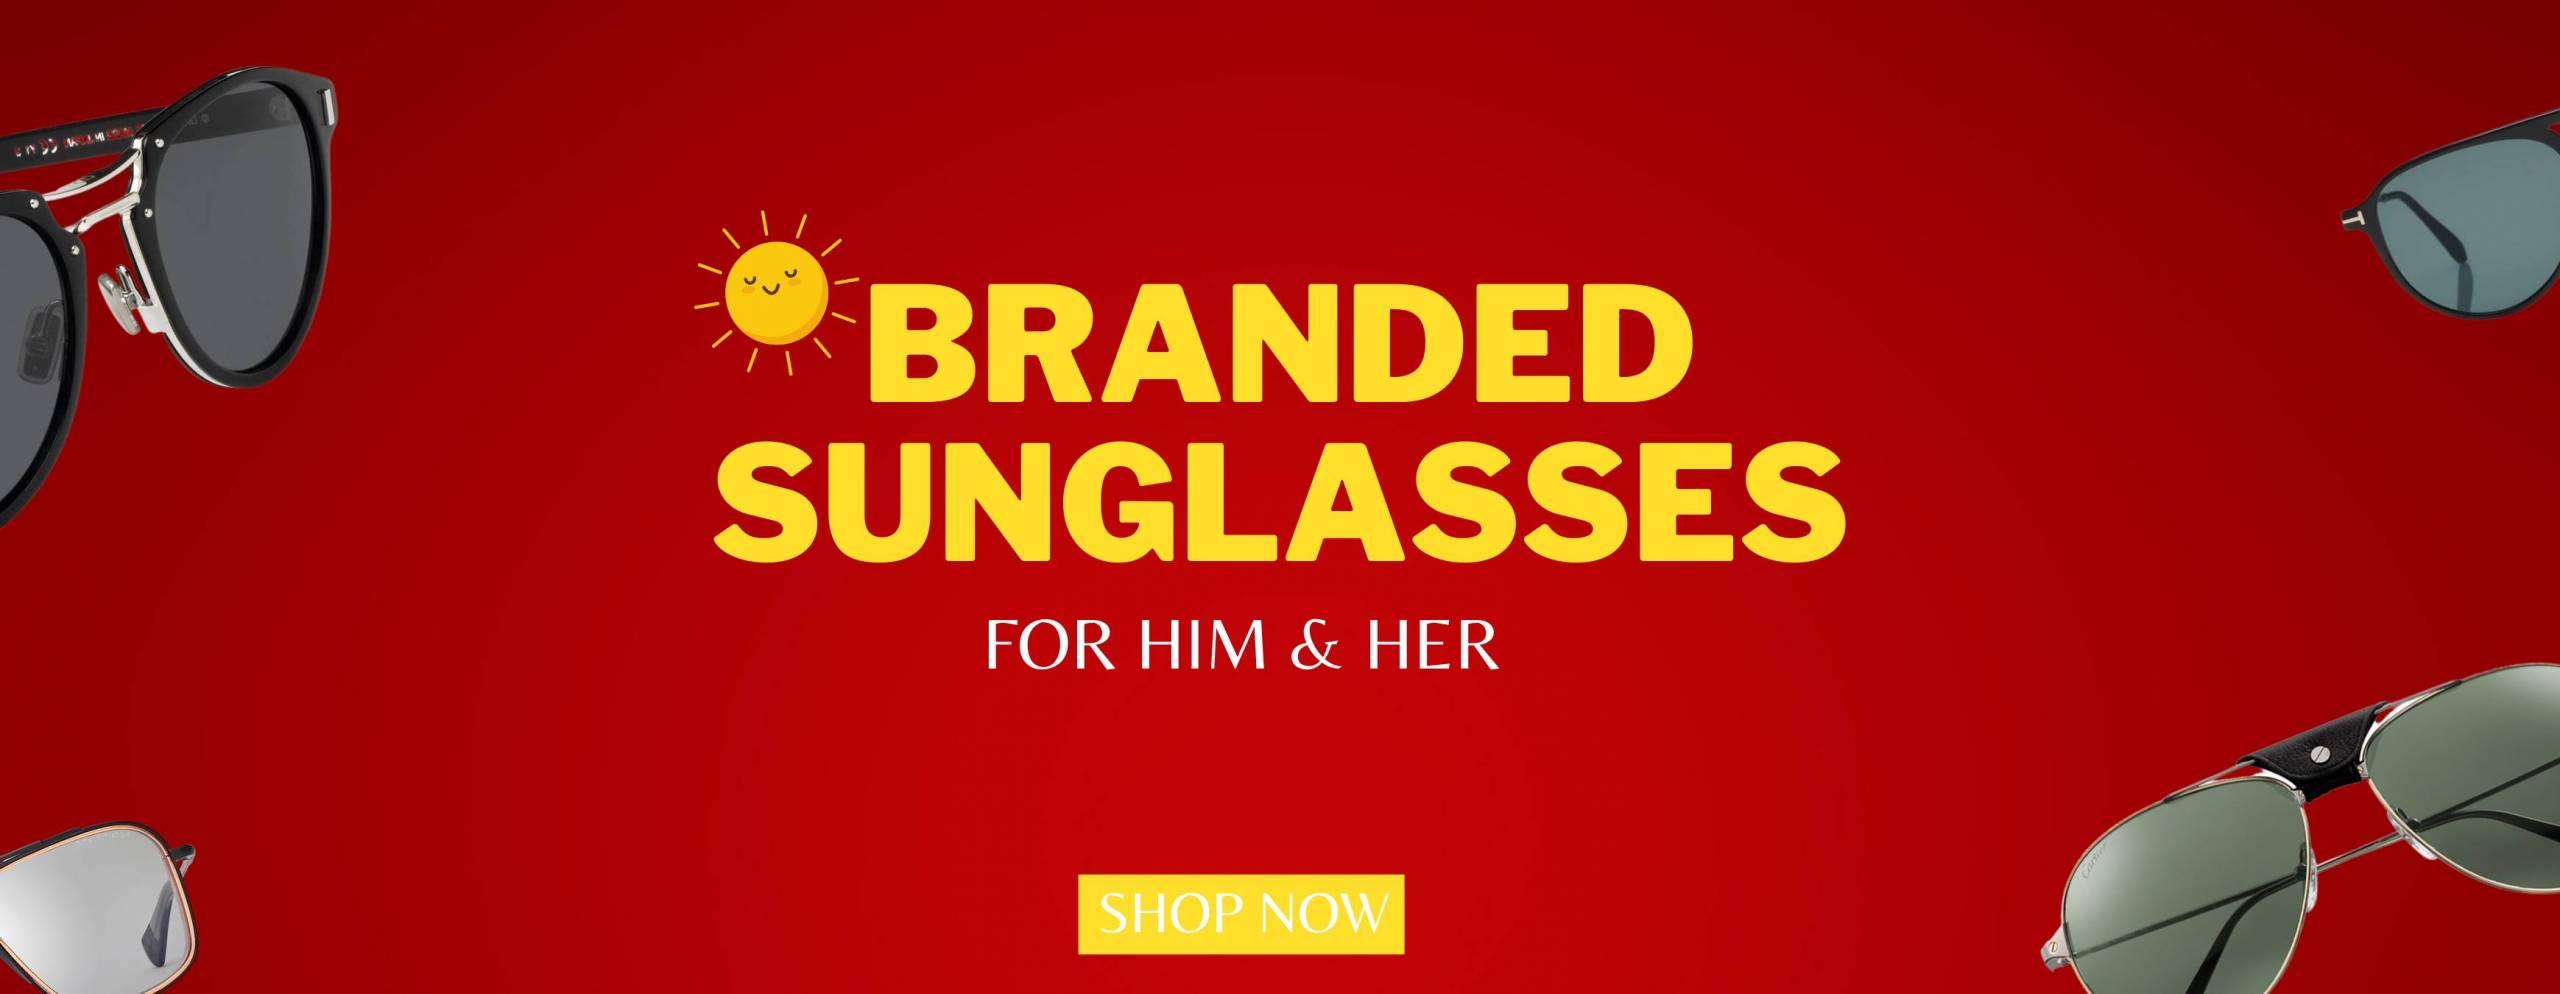 sunglasses banner